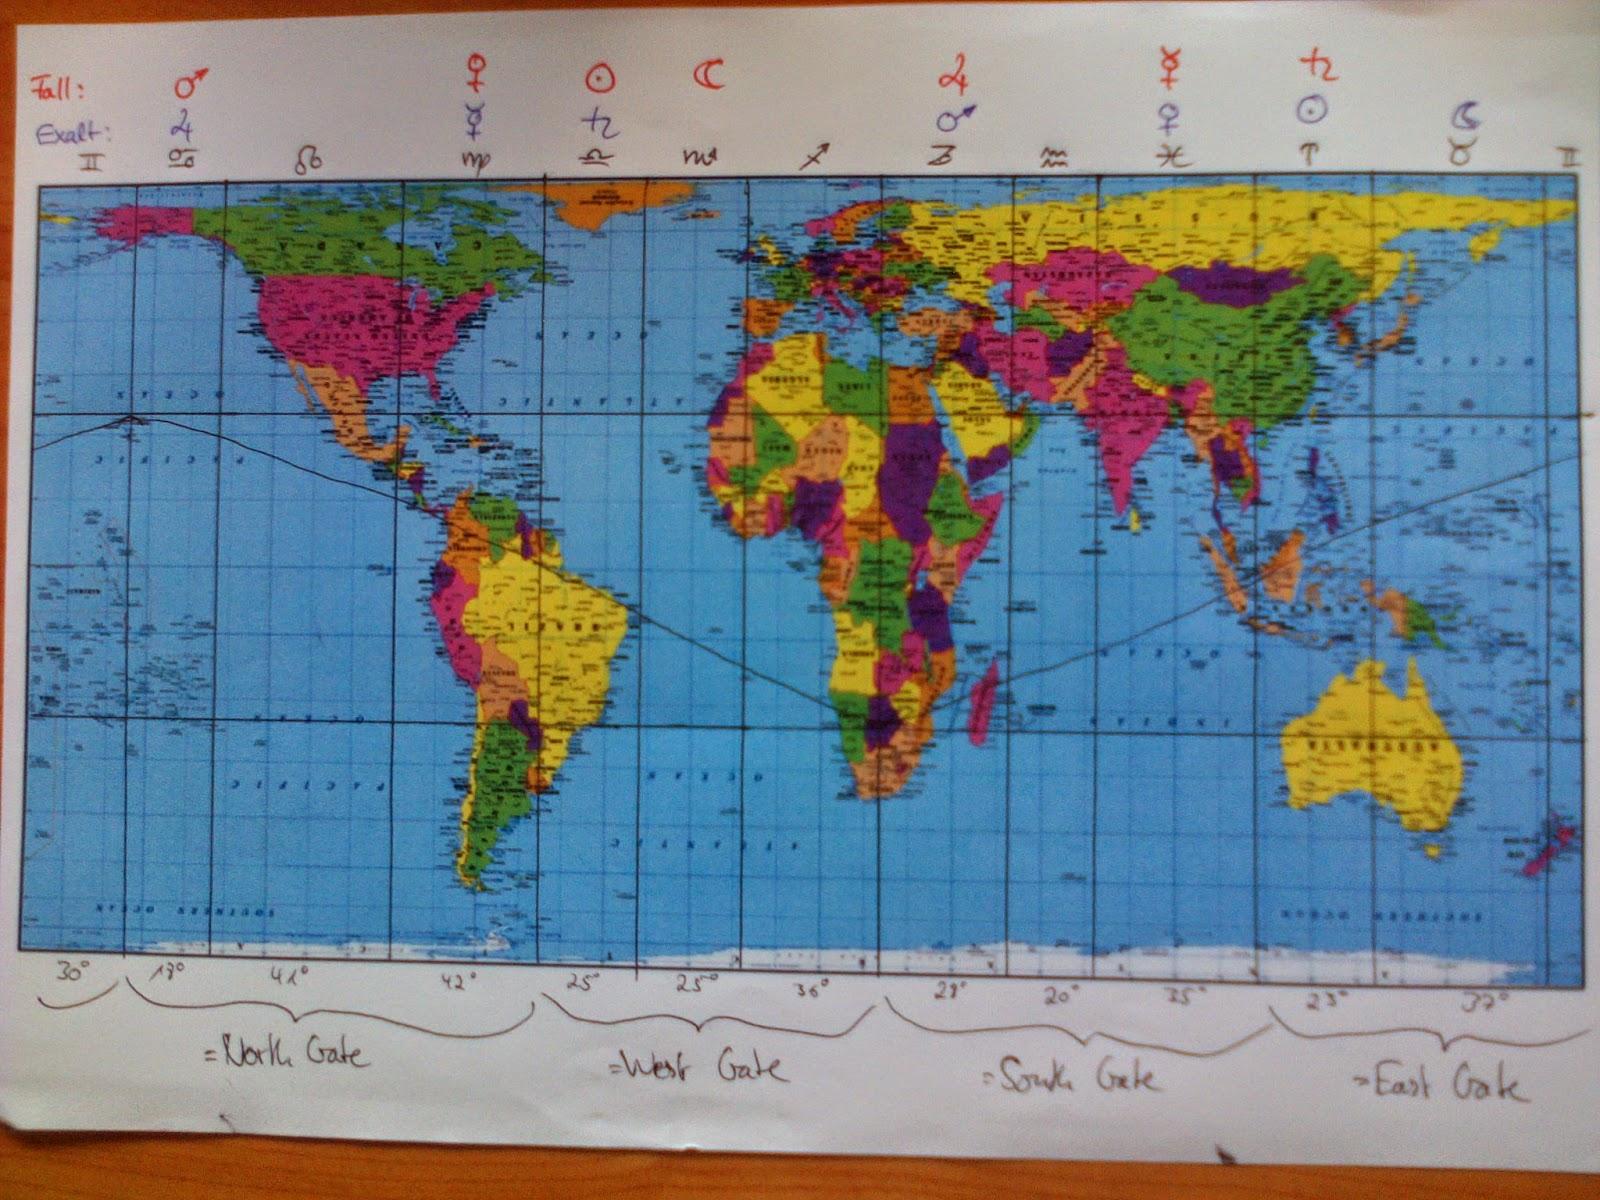 Map tropic cancer zodiac world map img 0866g d058e1558214591a5f8fdfcae95a4e3f tropics gumiabroncs Gallery